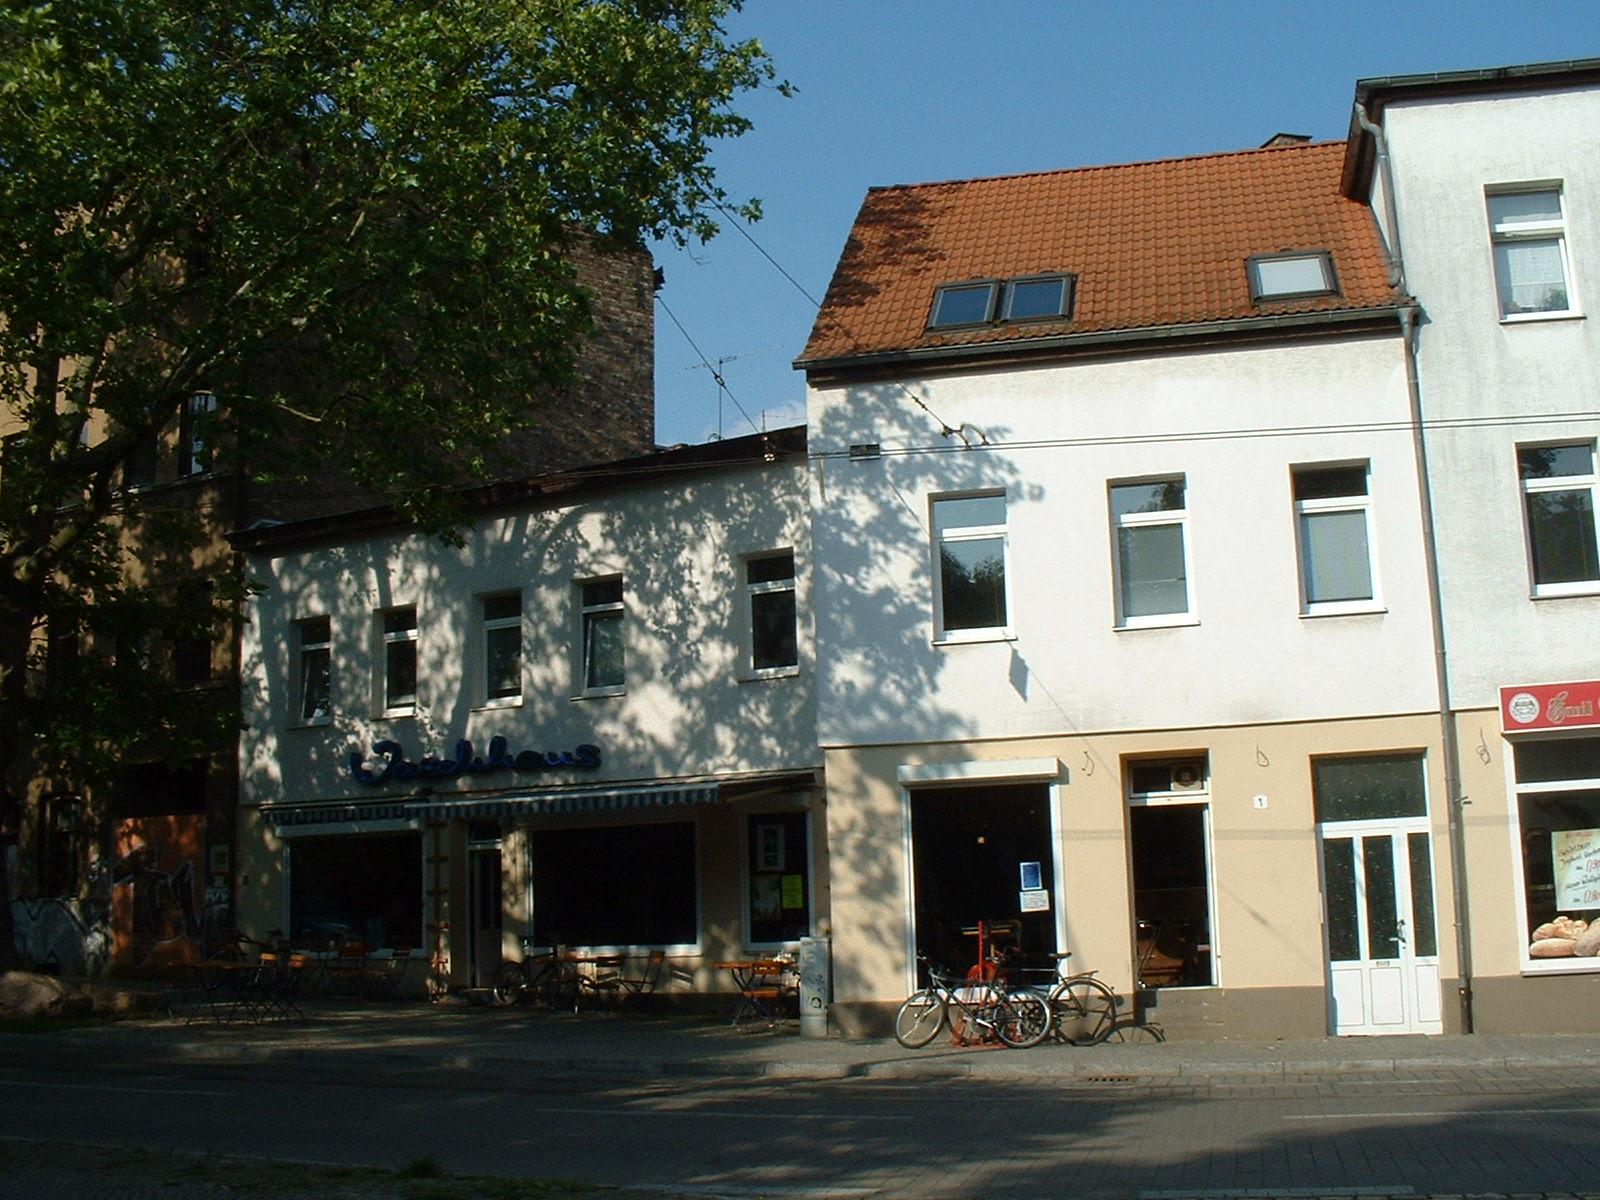 Sb-Waschsalon Halle (Saale)